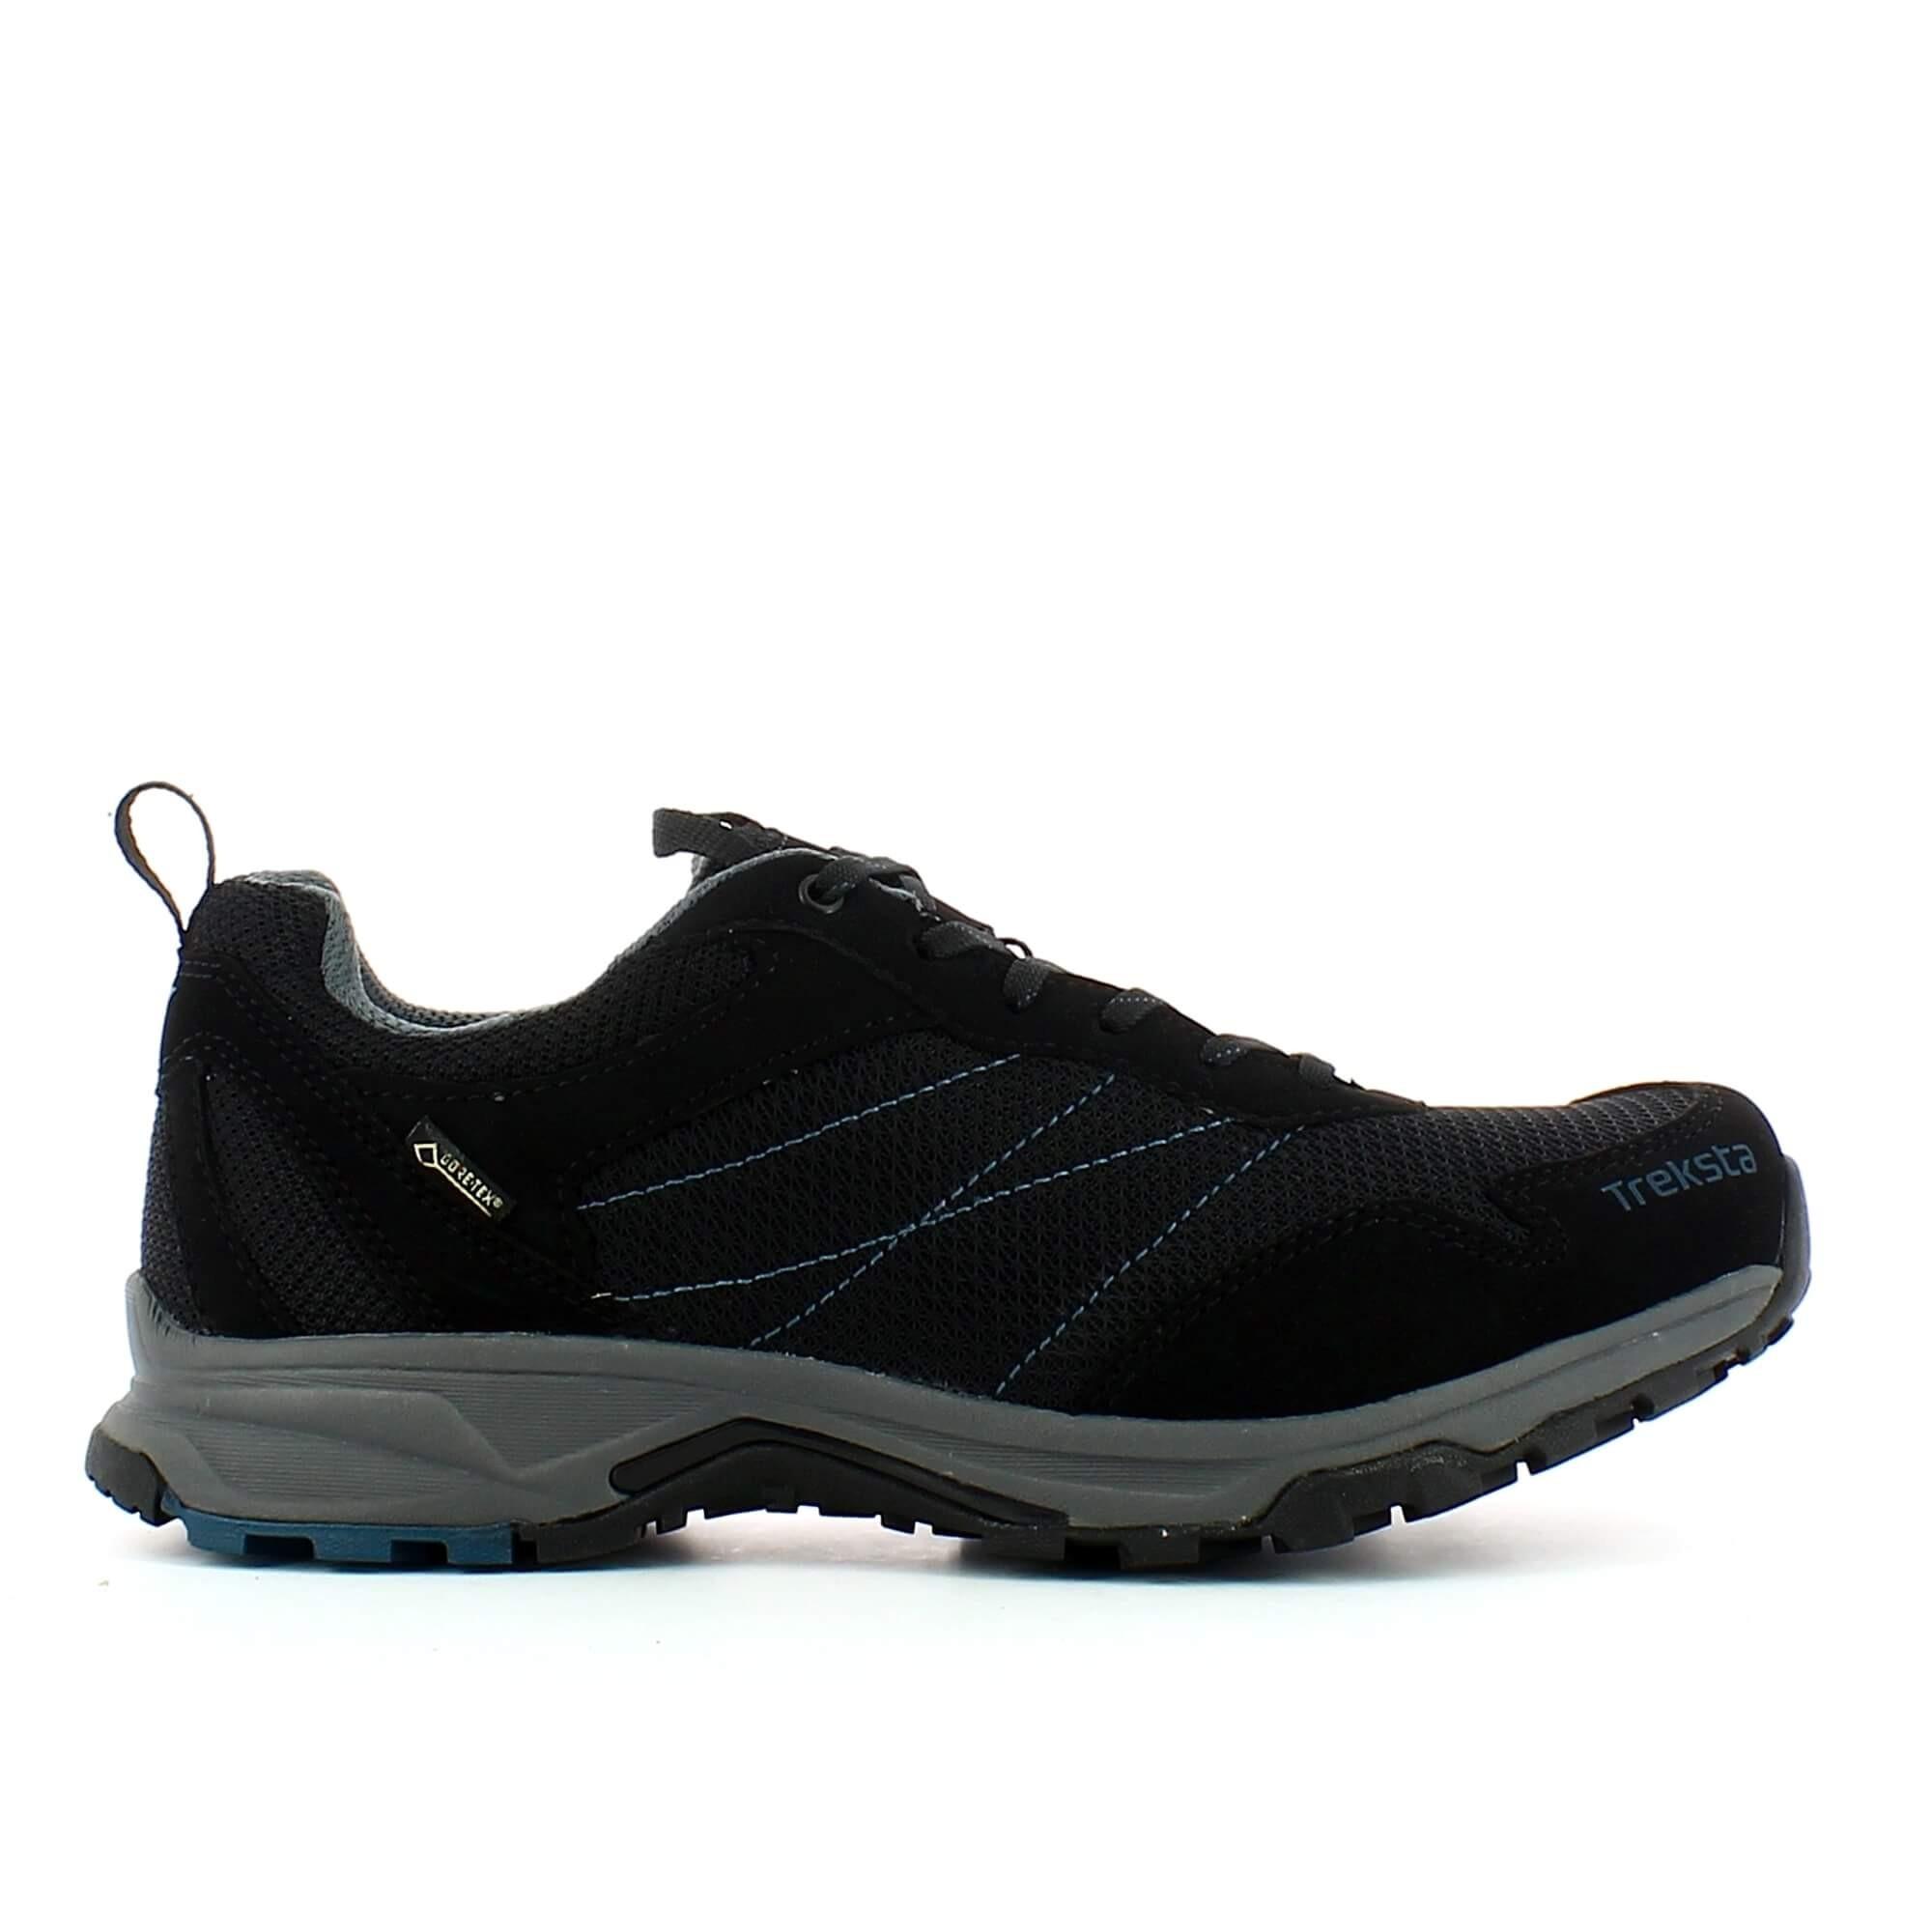 e84c4bf2 Venta de Zapatillas de Trekking para Hombre - Deportes Moya